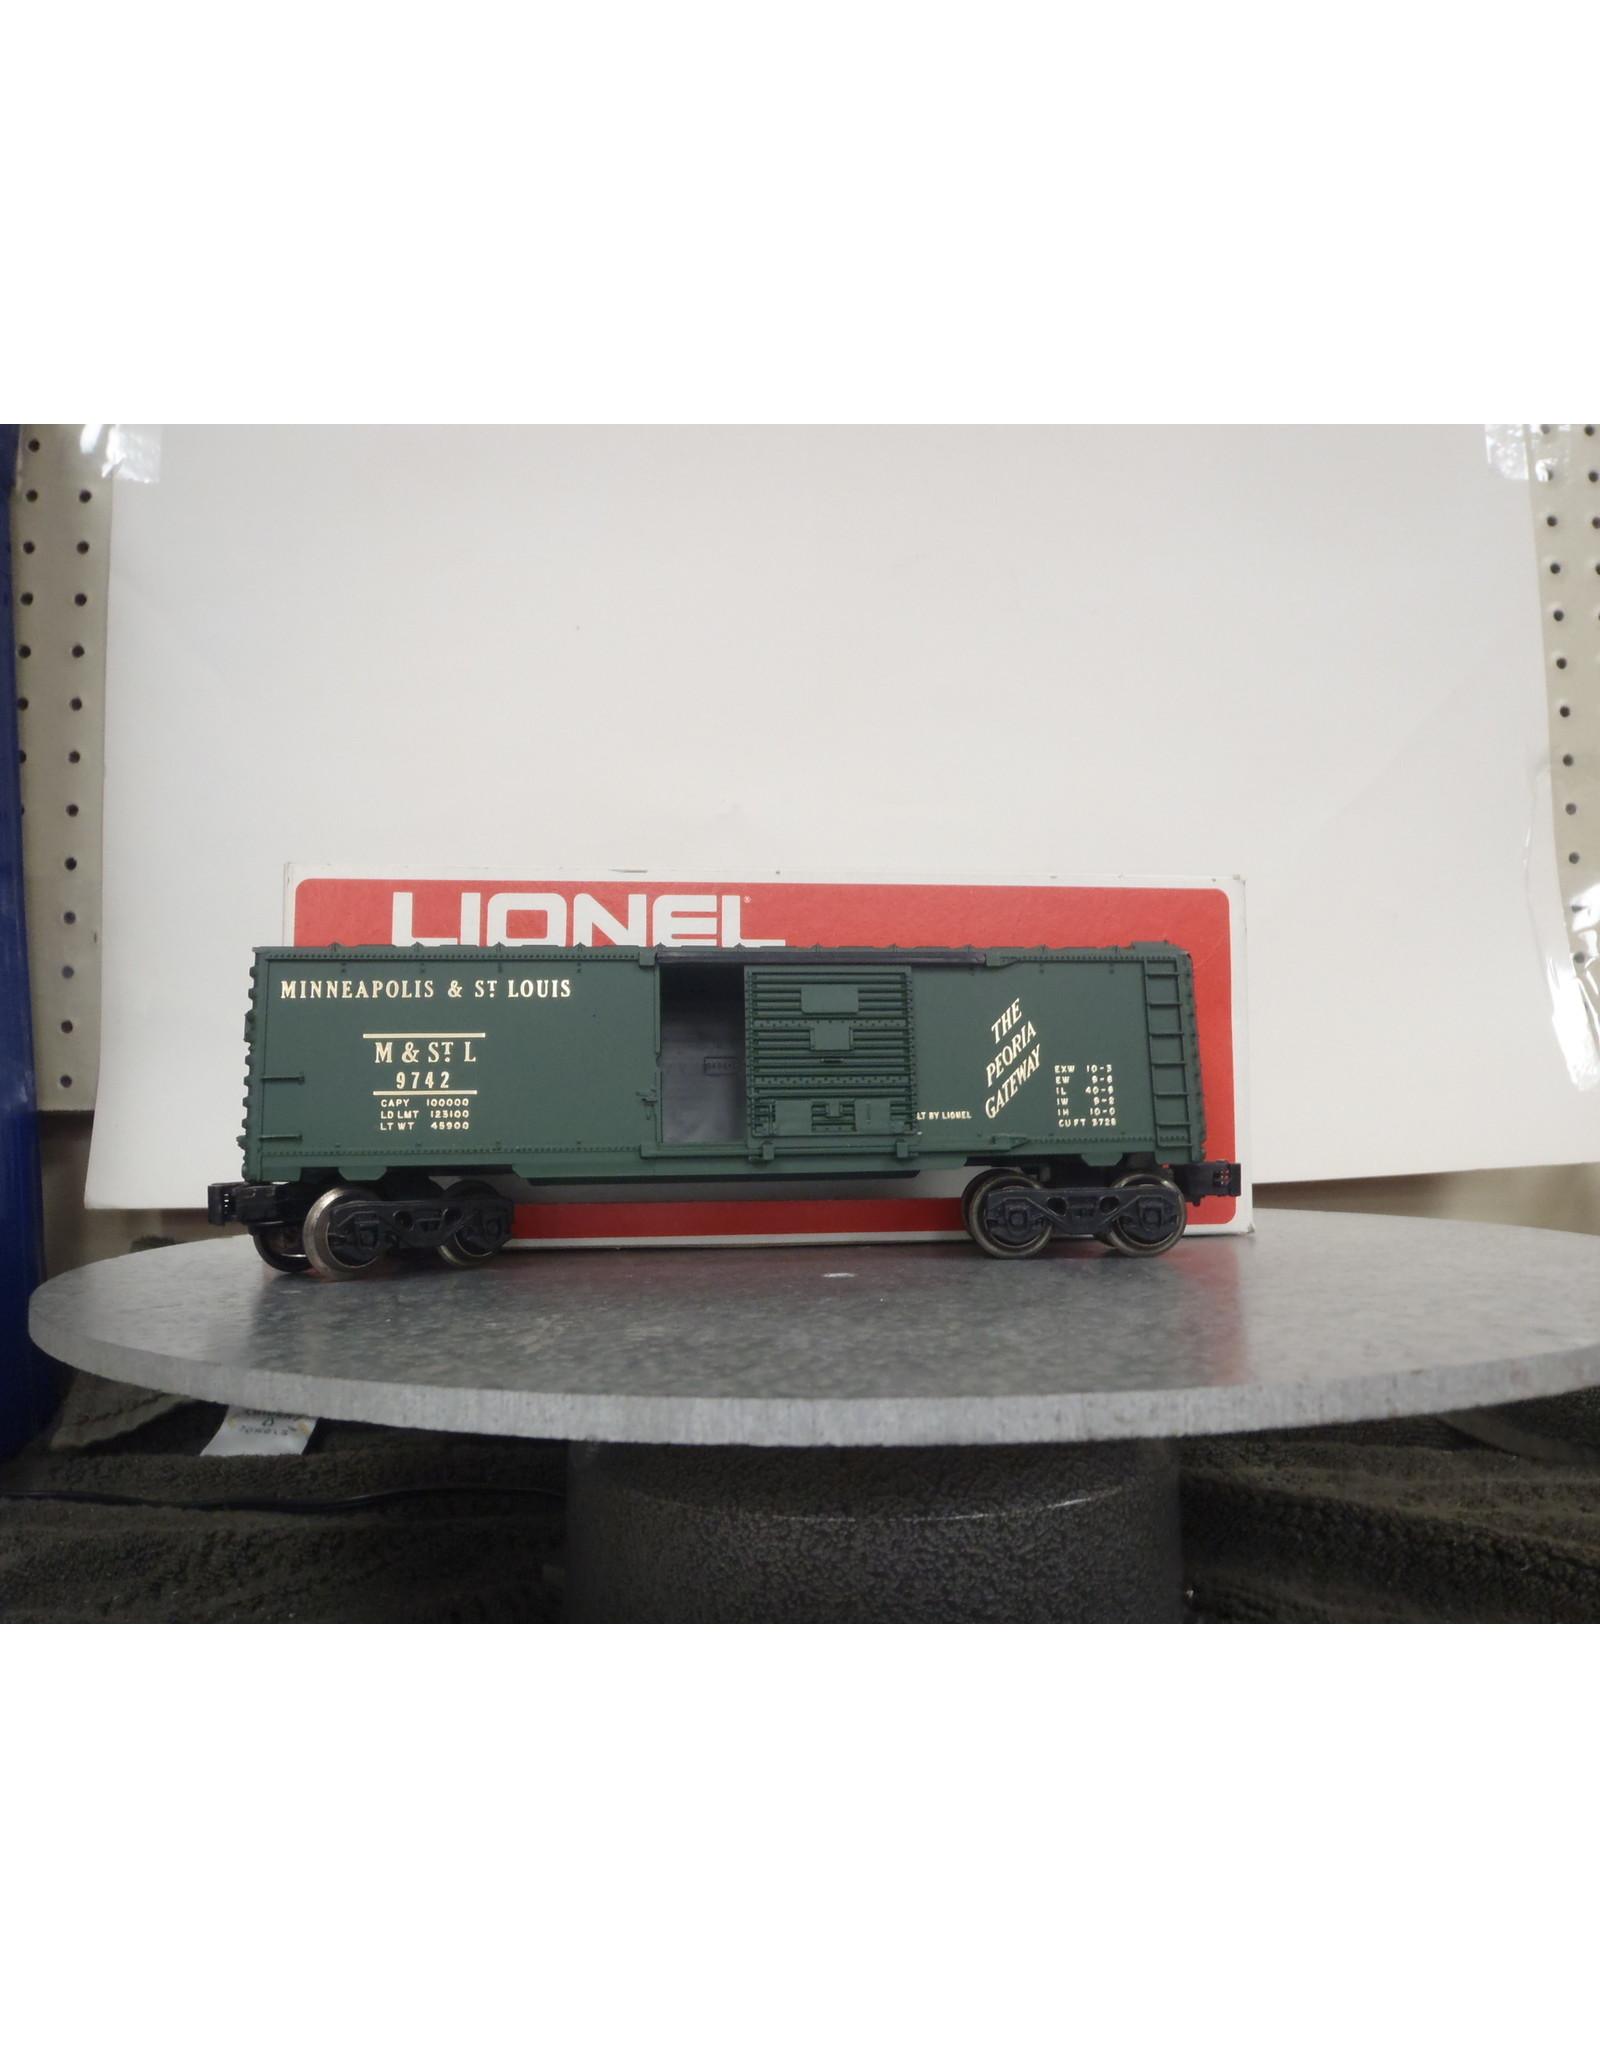 Lionel Boxcar Minn & St Louis 9742